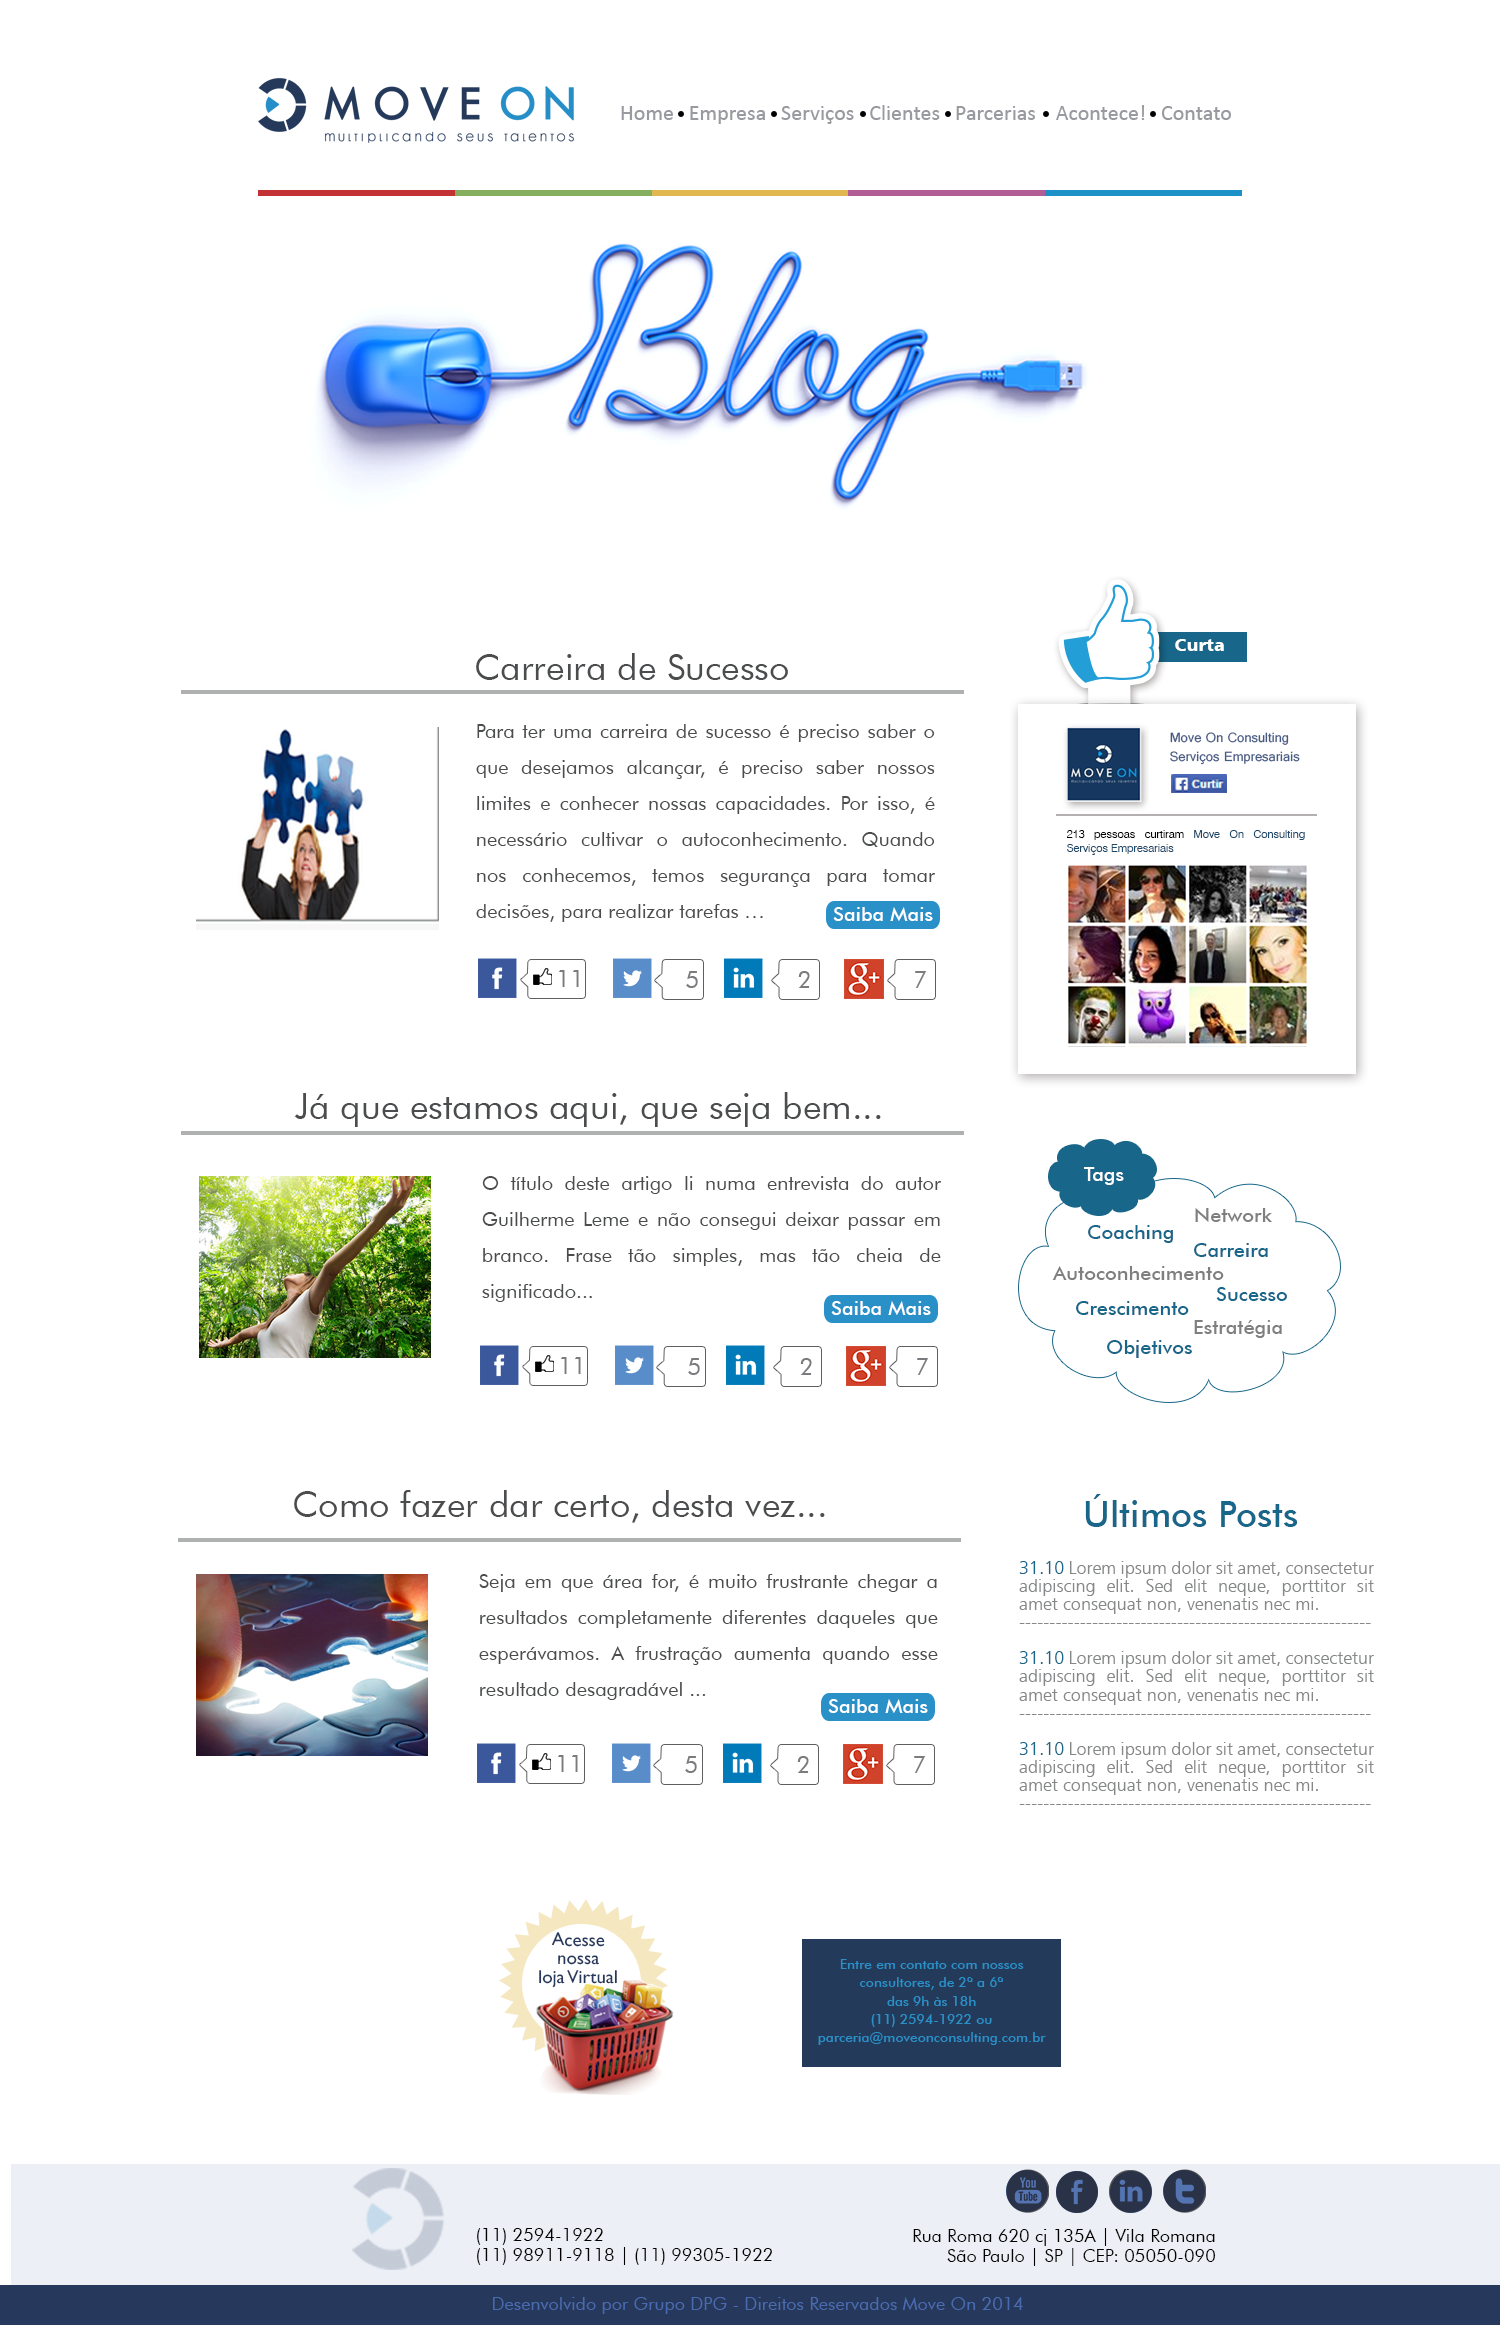 move on blog 30-10